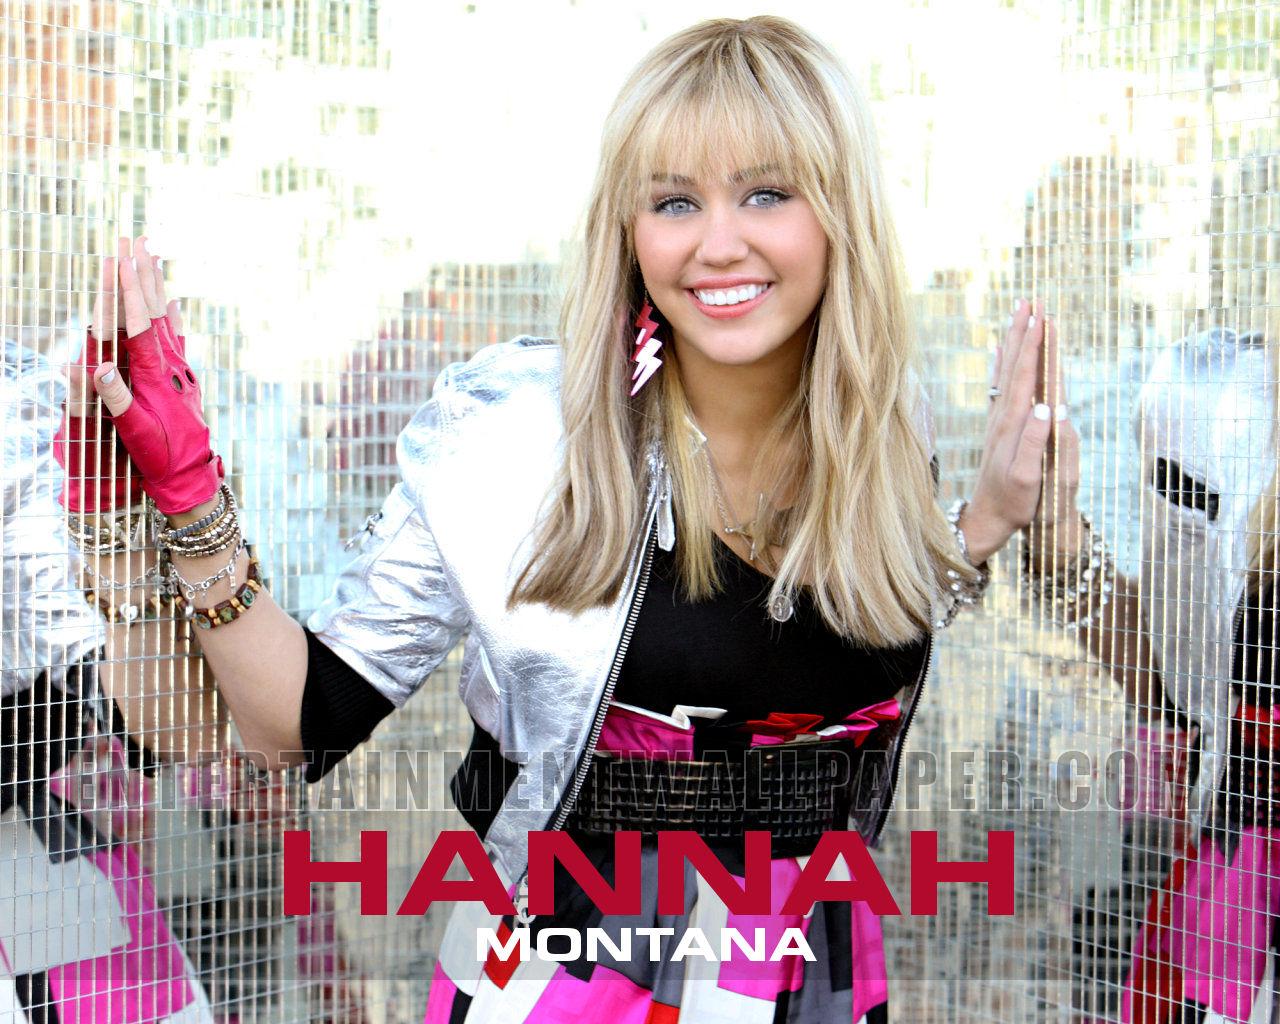 Hannah montana wallpapers